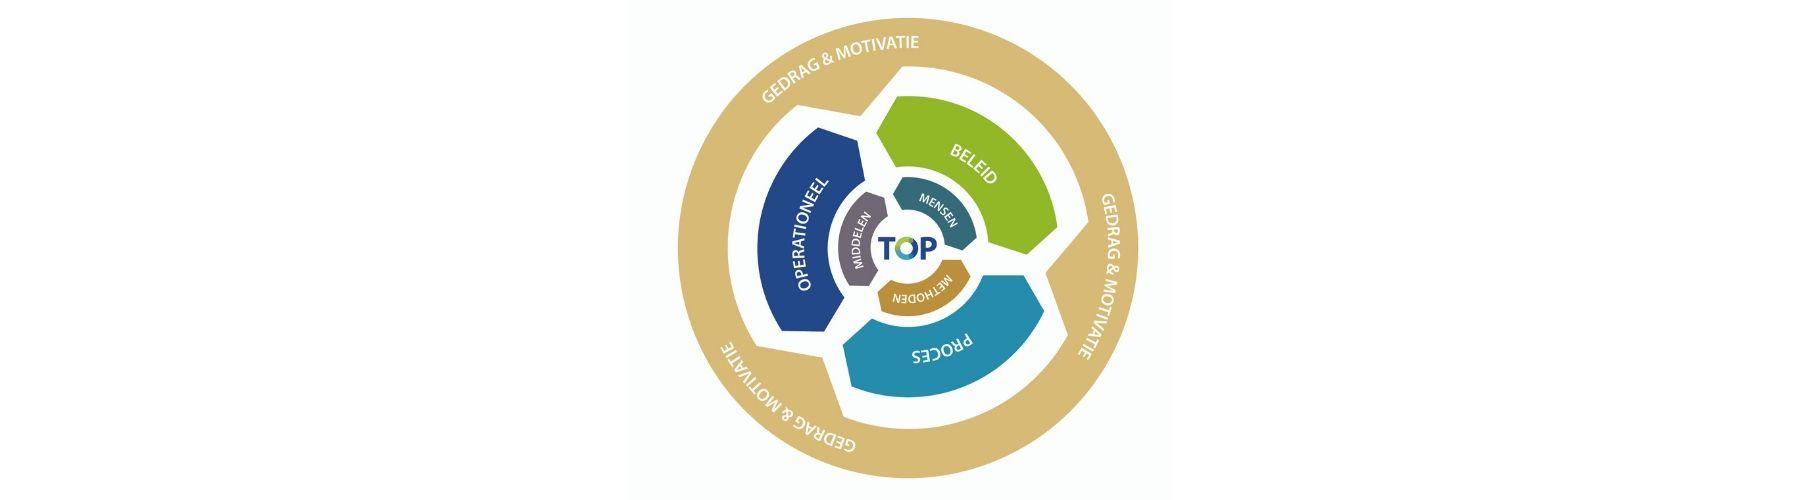 TOP Advies cirkel model